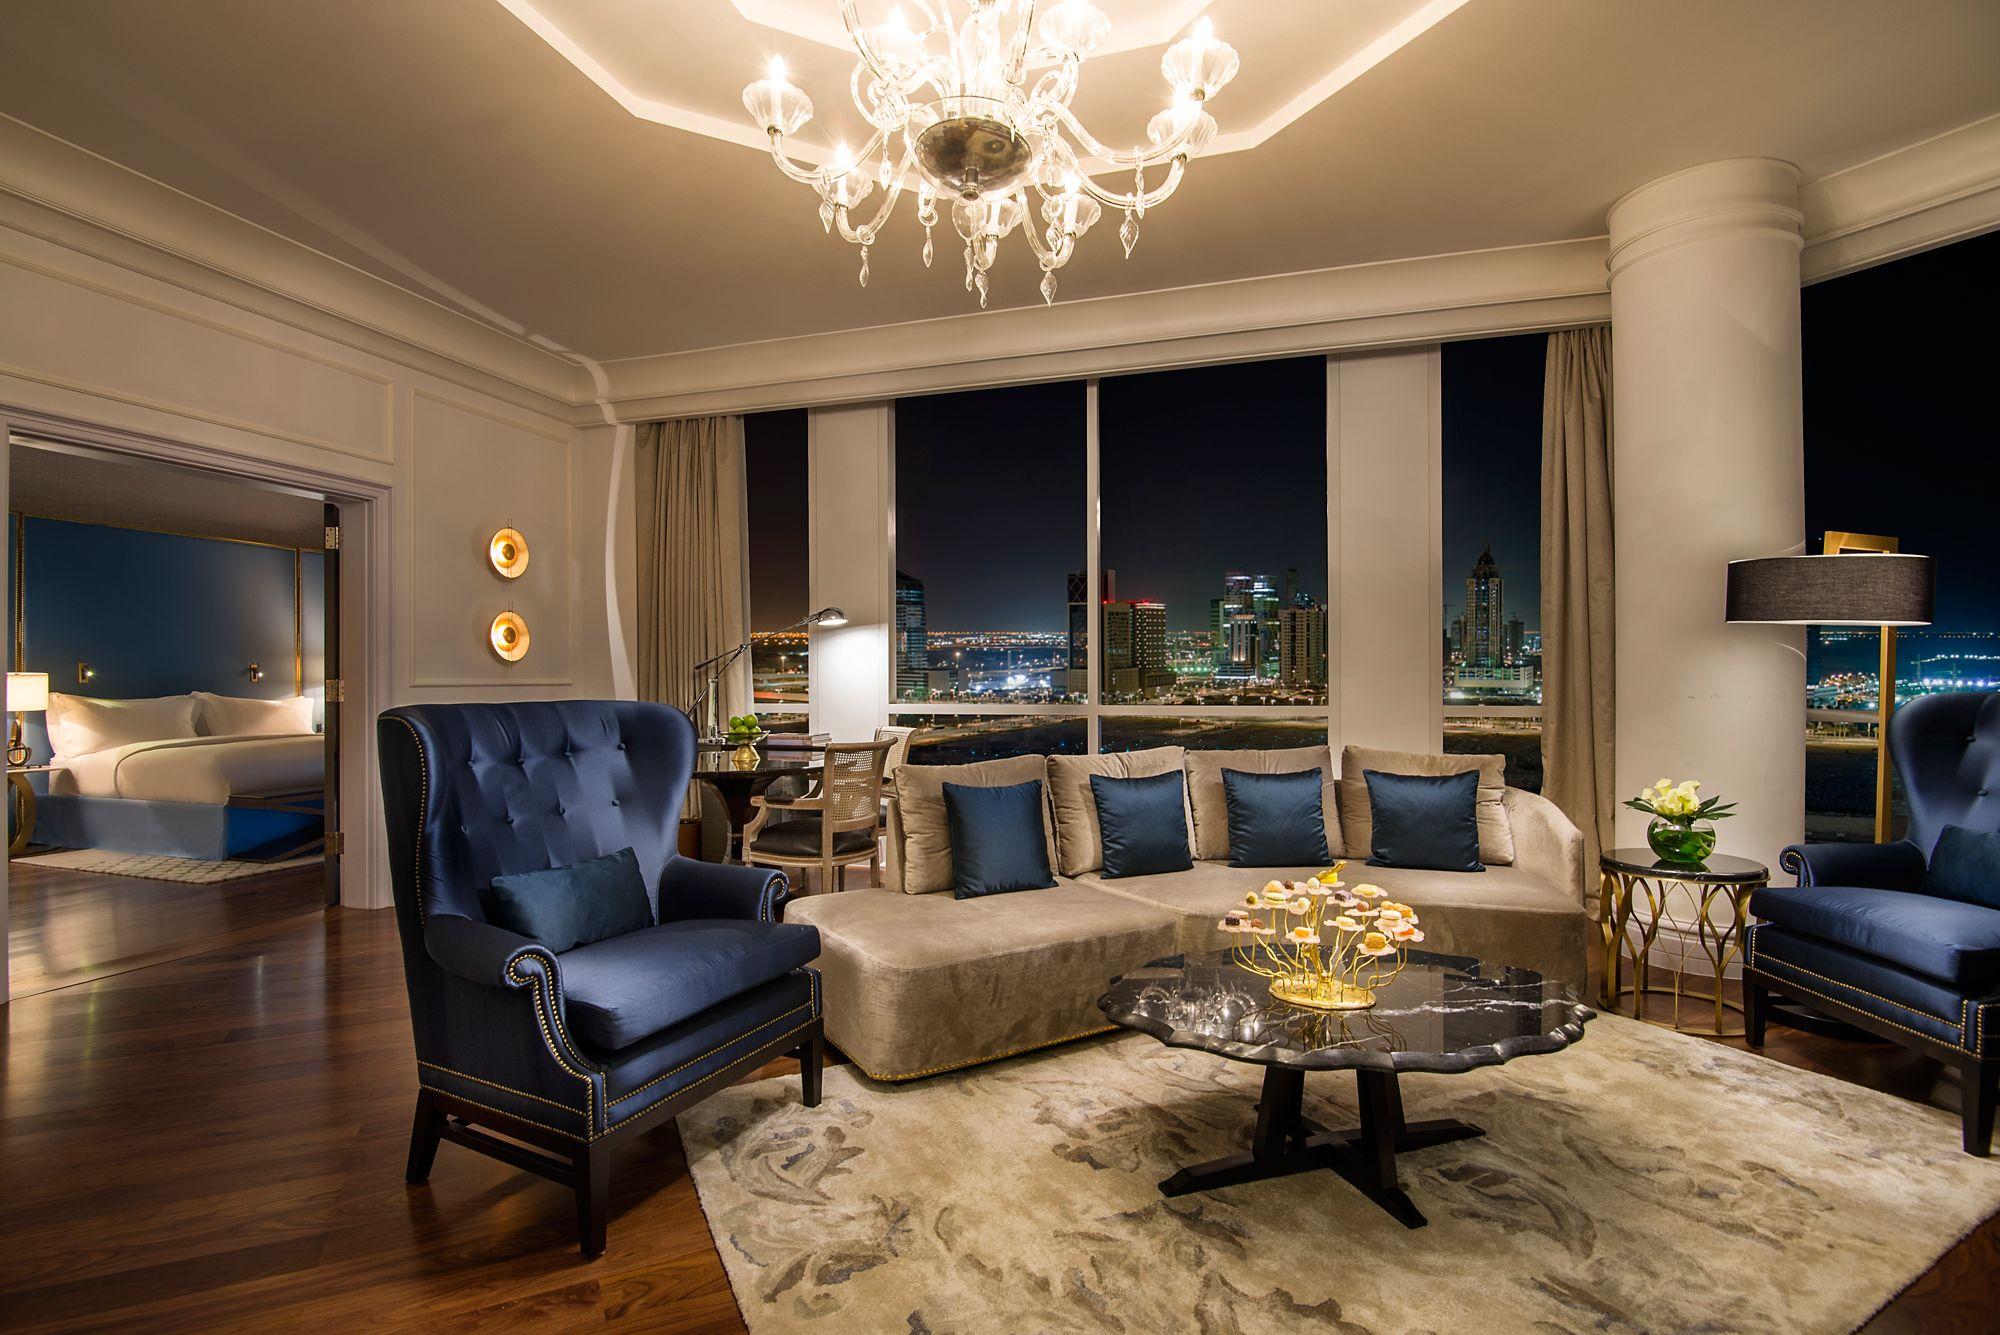 Executive Suite In Doha Qatar The Ritz Carlton Doha